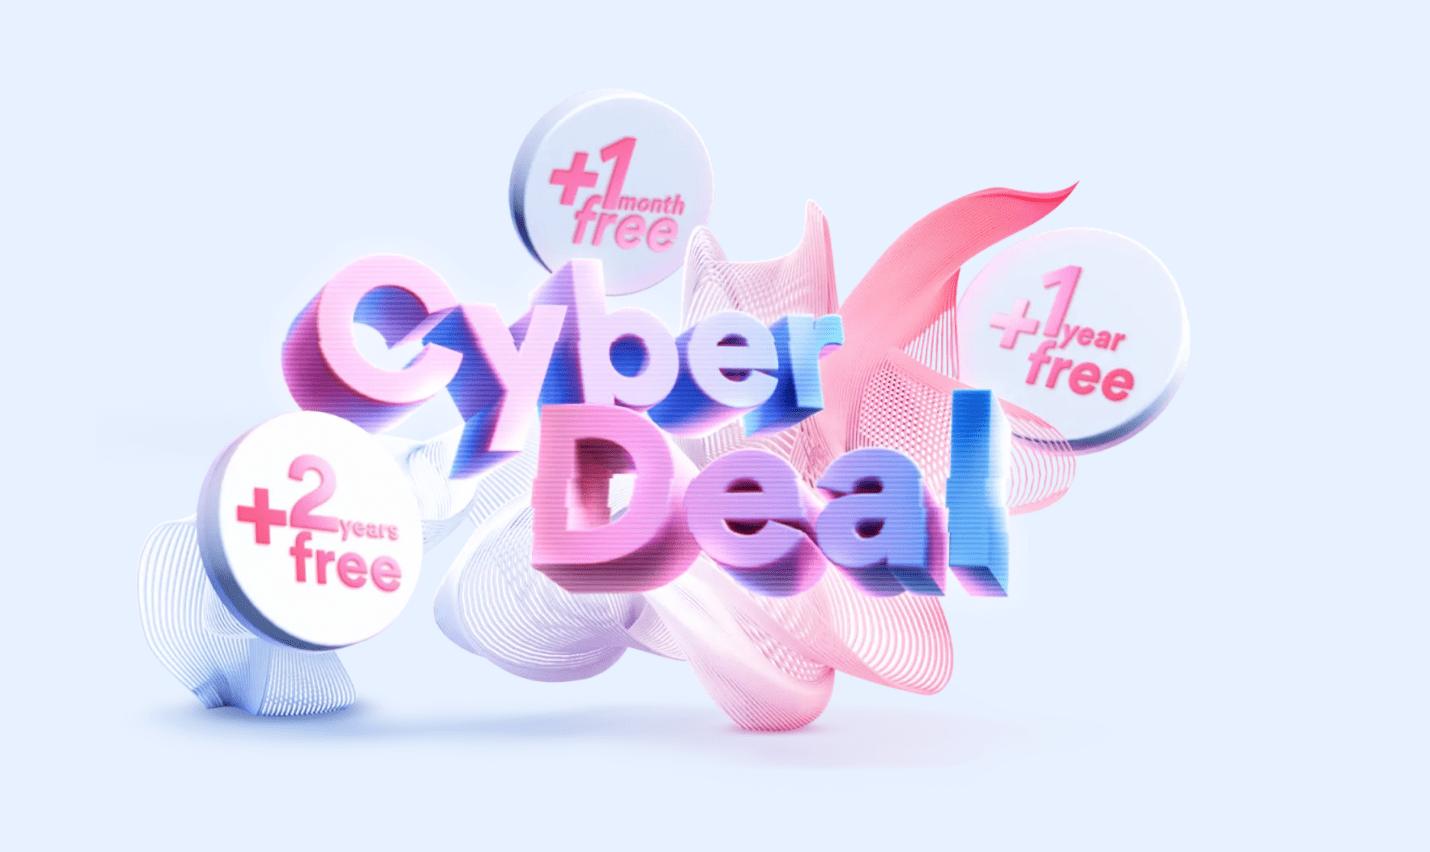 NordVPN Cyber Deal Black Friday 2020